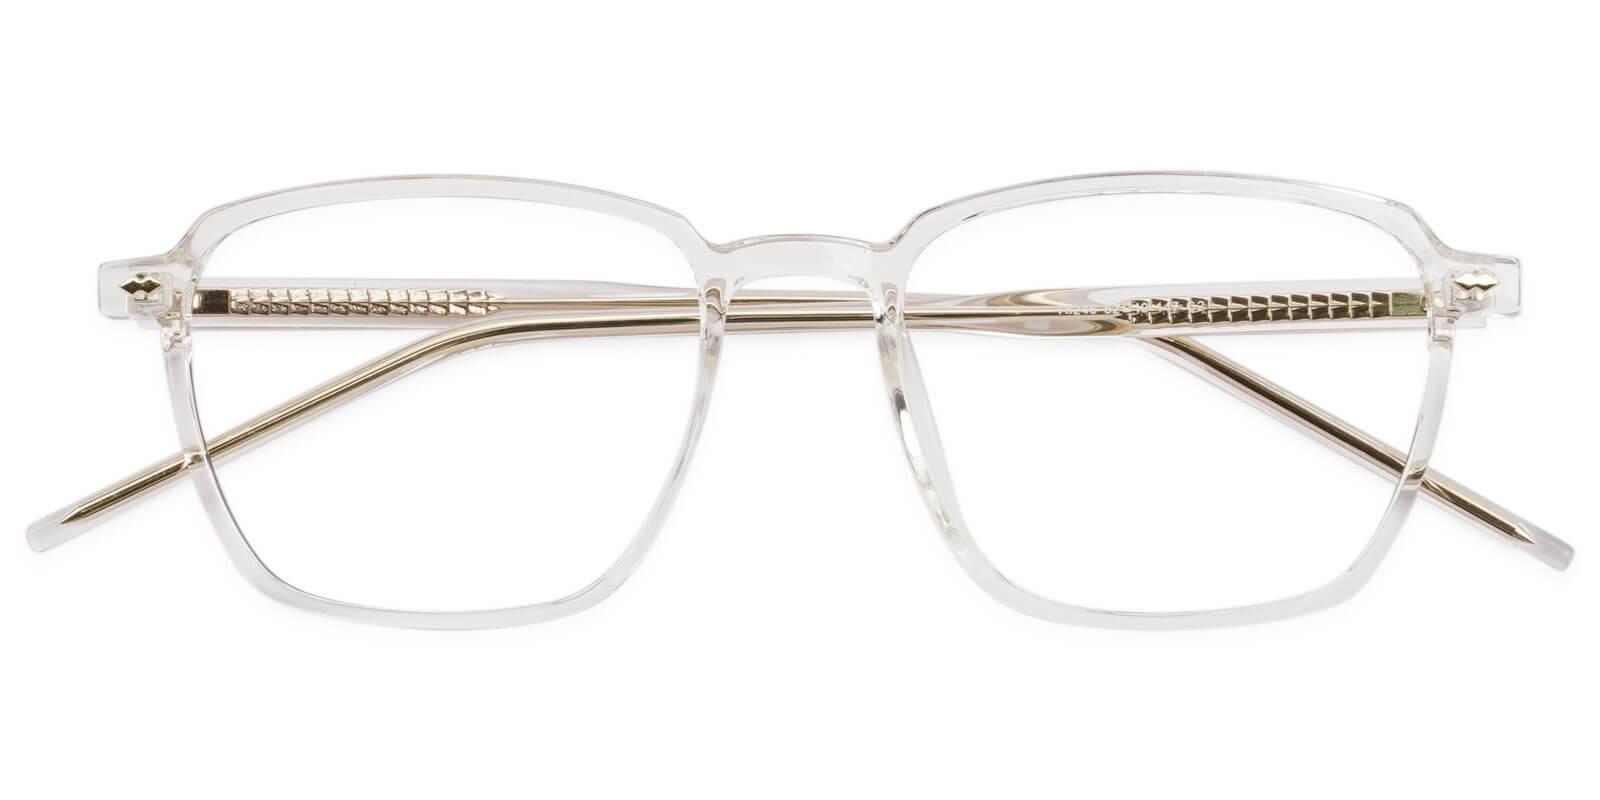 Flume Translucent TR Eyeglasses , SpringHinges , UniversalBridgeFit Frames from ABBE Glasses